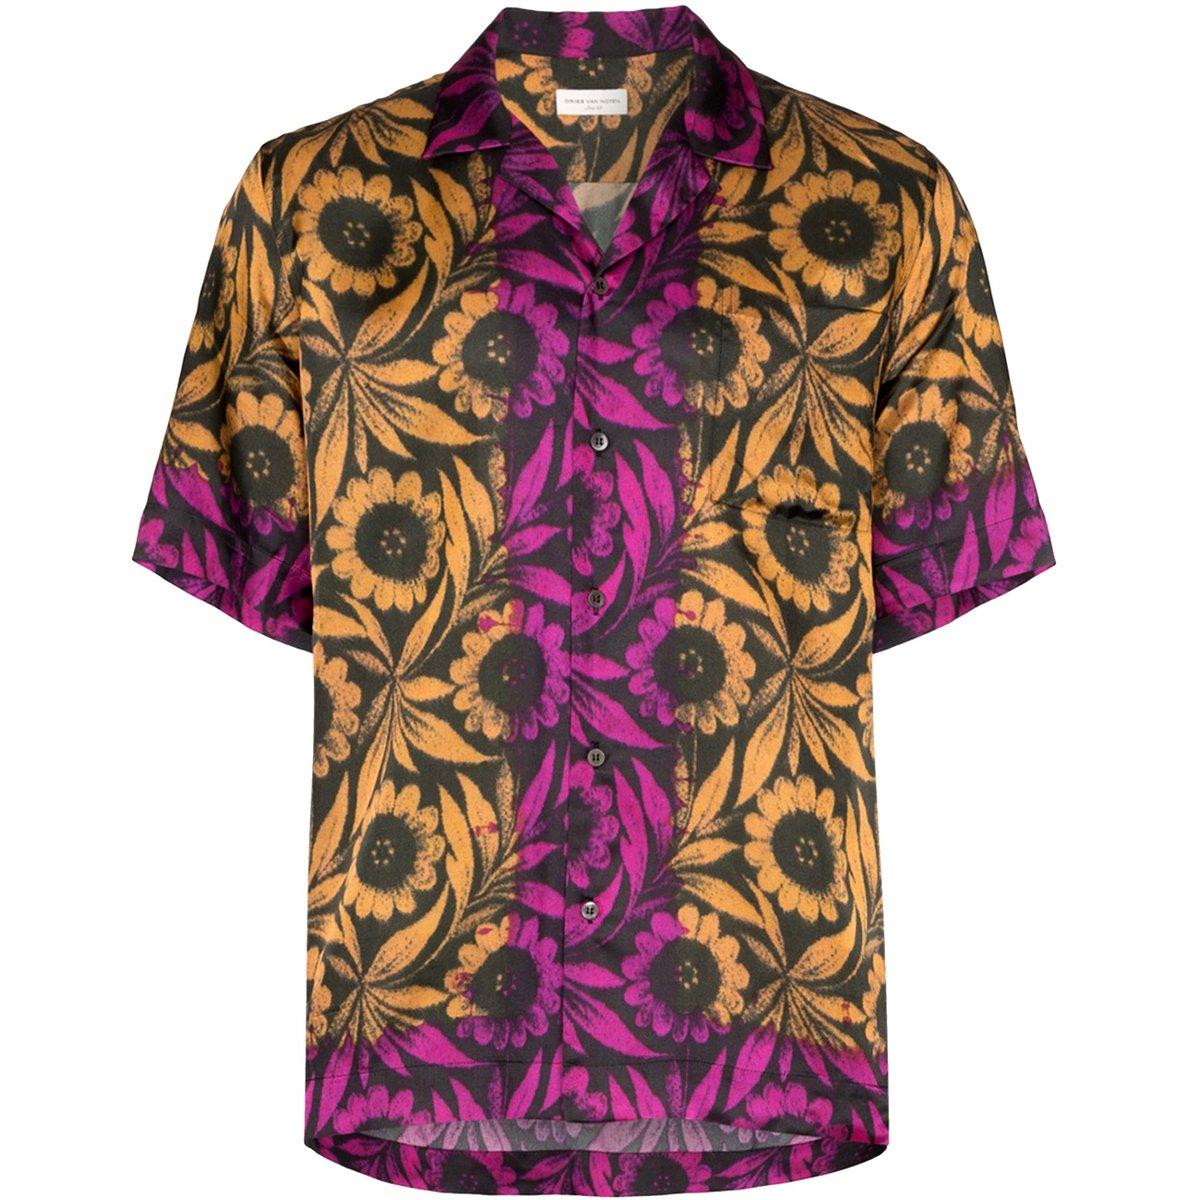 dries-van-noten-carlton-printed-shirt_14139289_20088723_1920.jpg